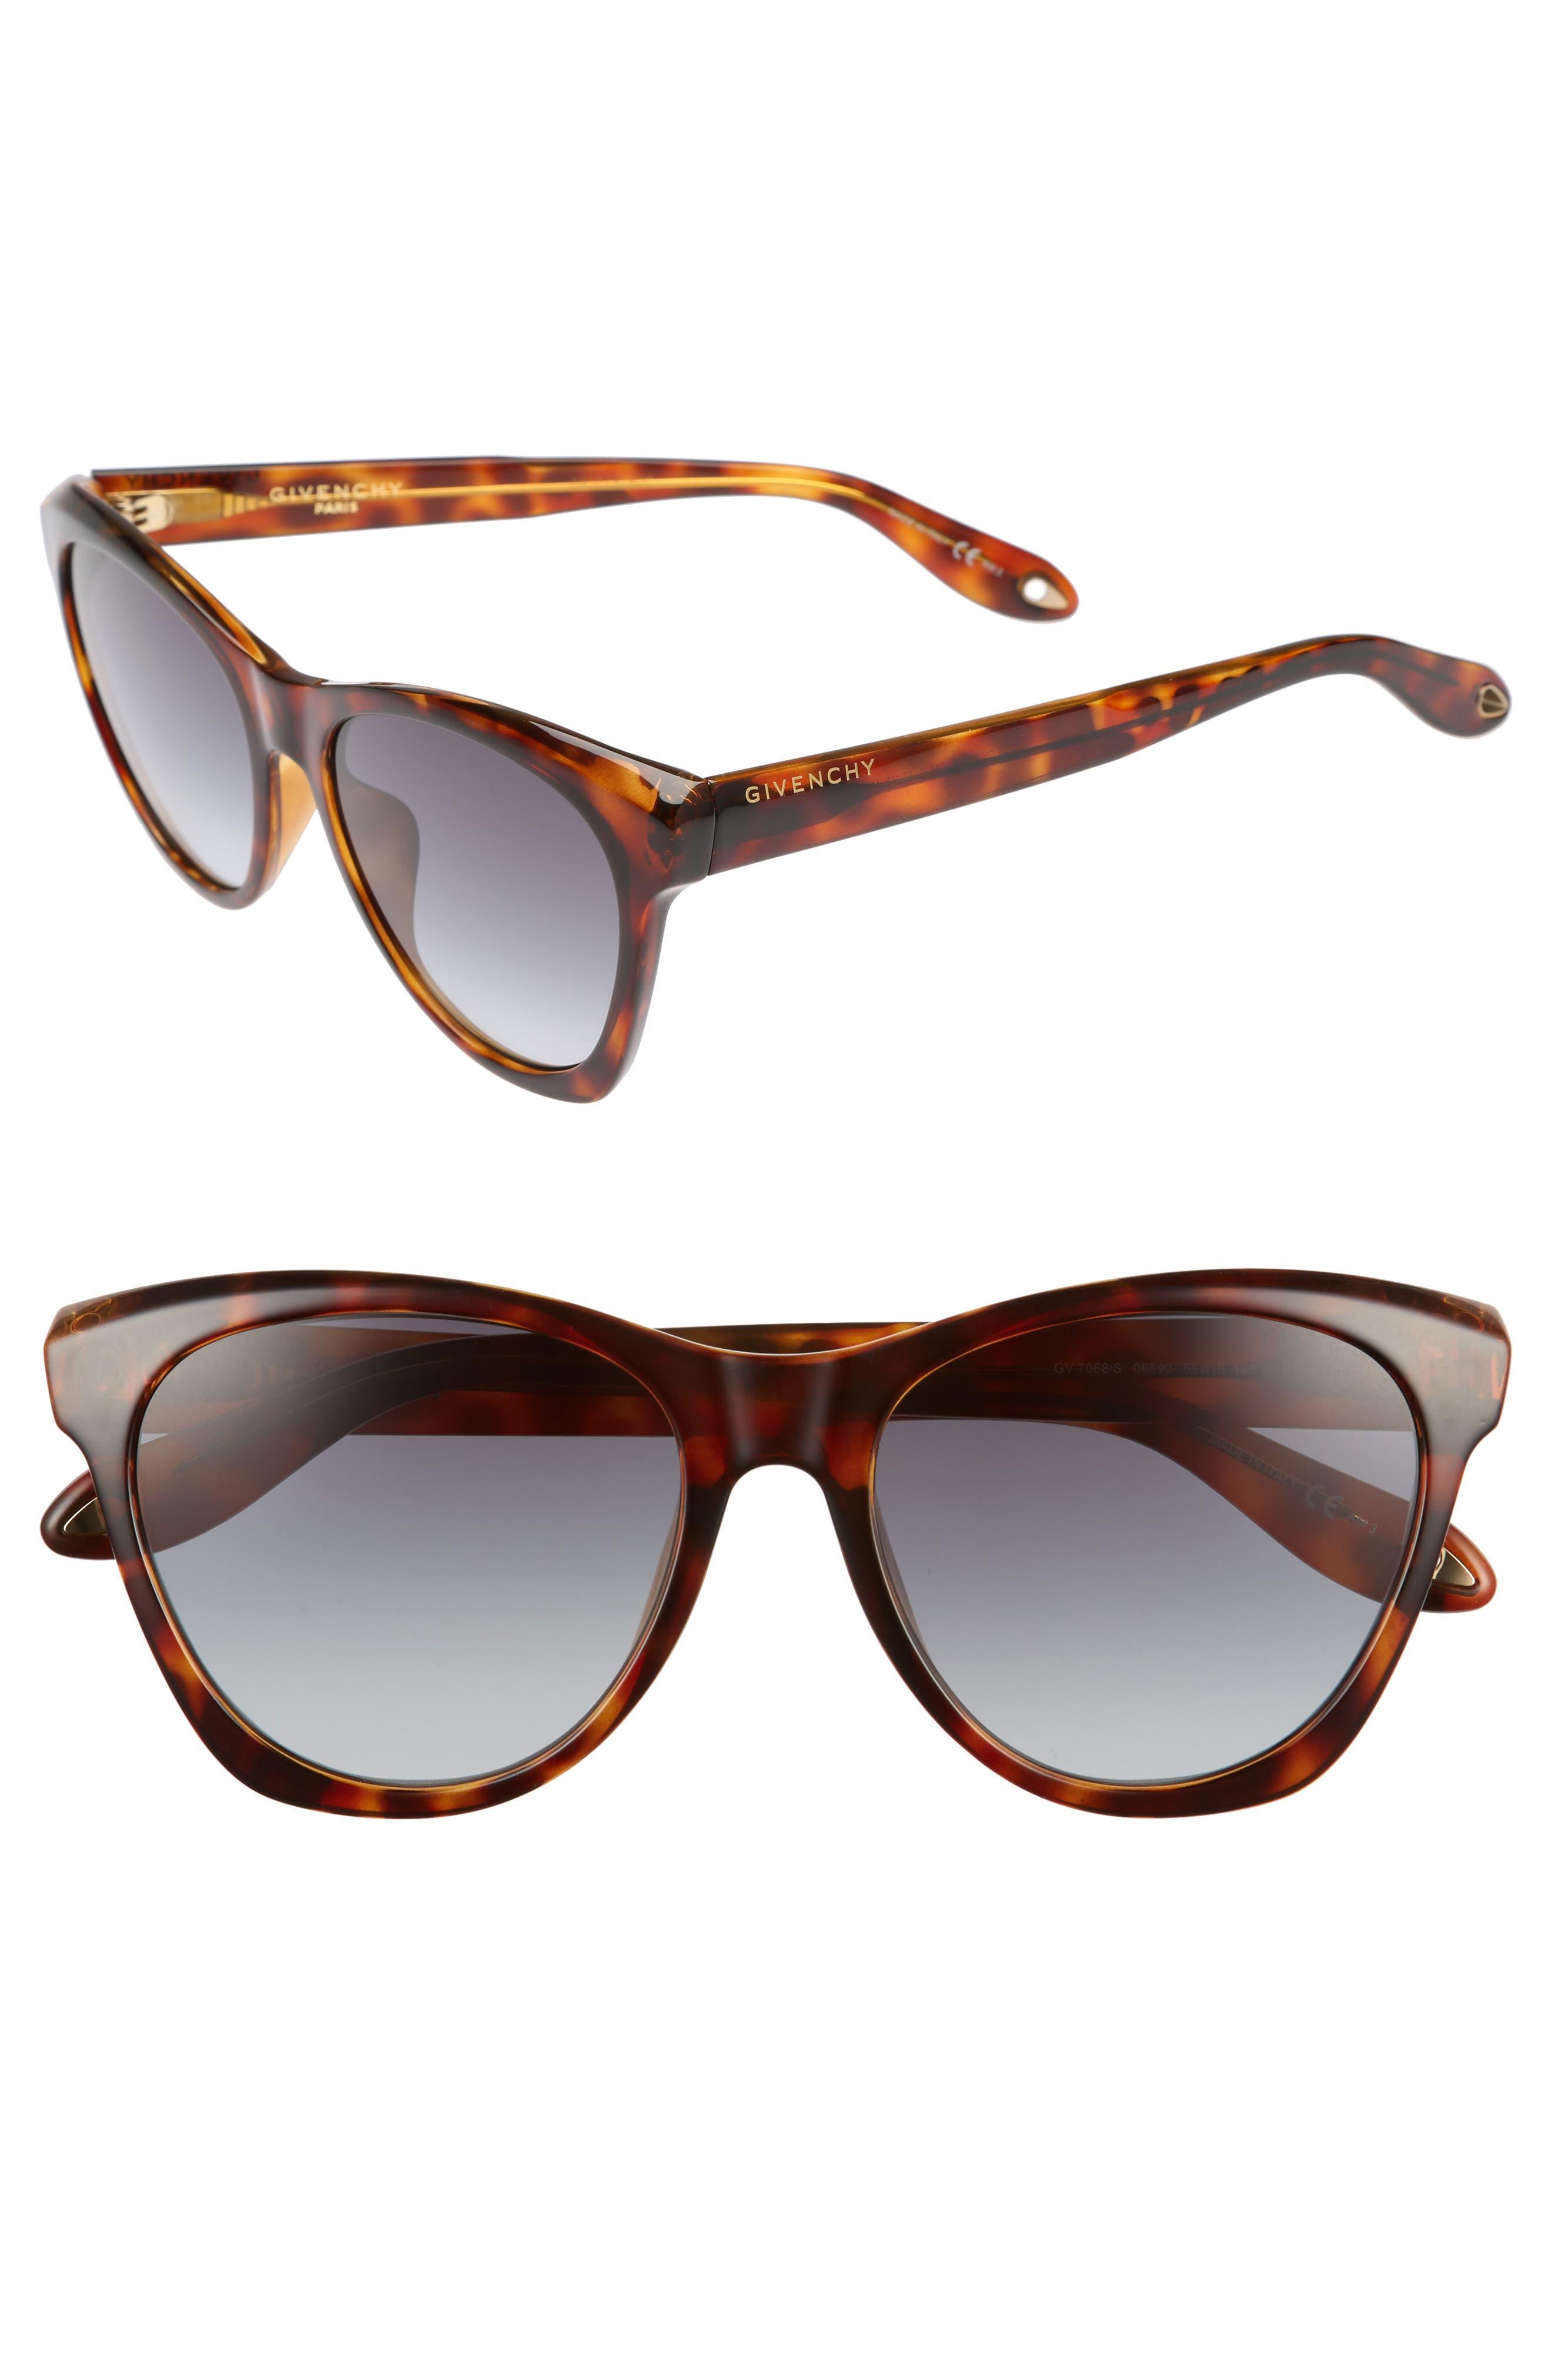 Main Image - Givenchy 55mm Cat Eye Sunglasses